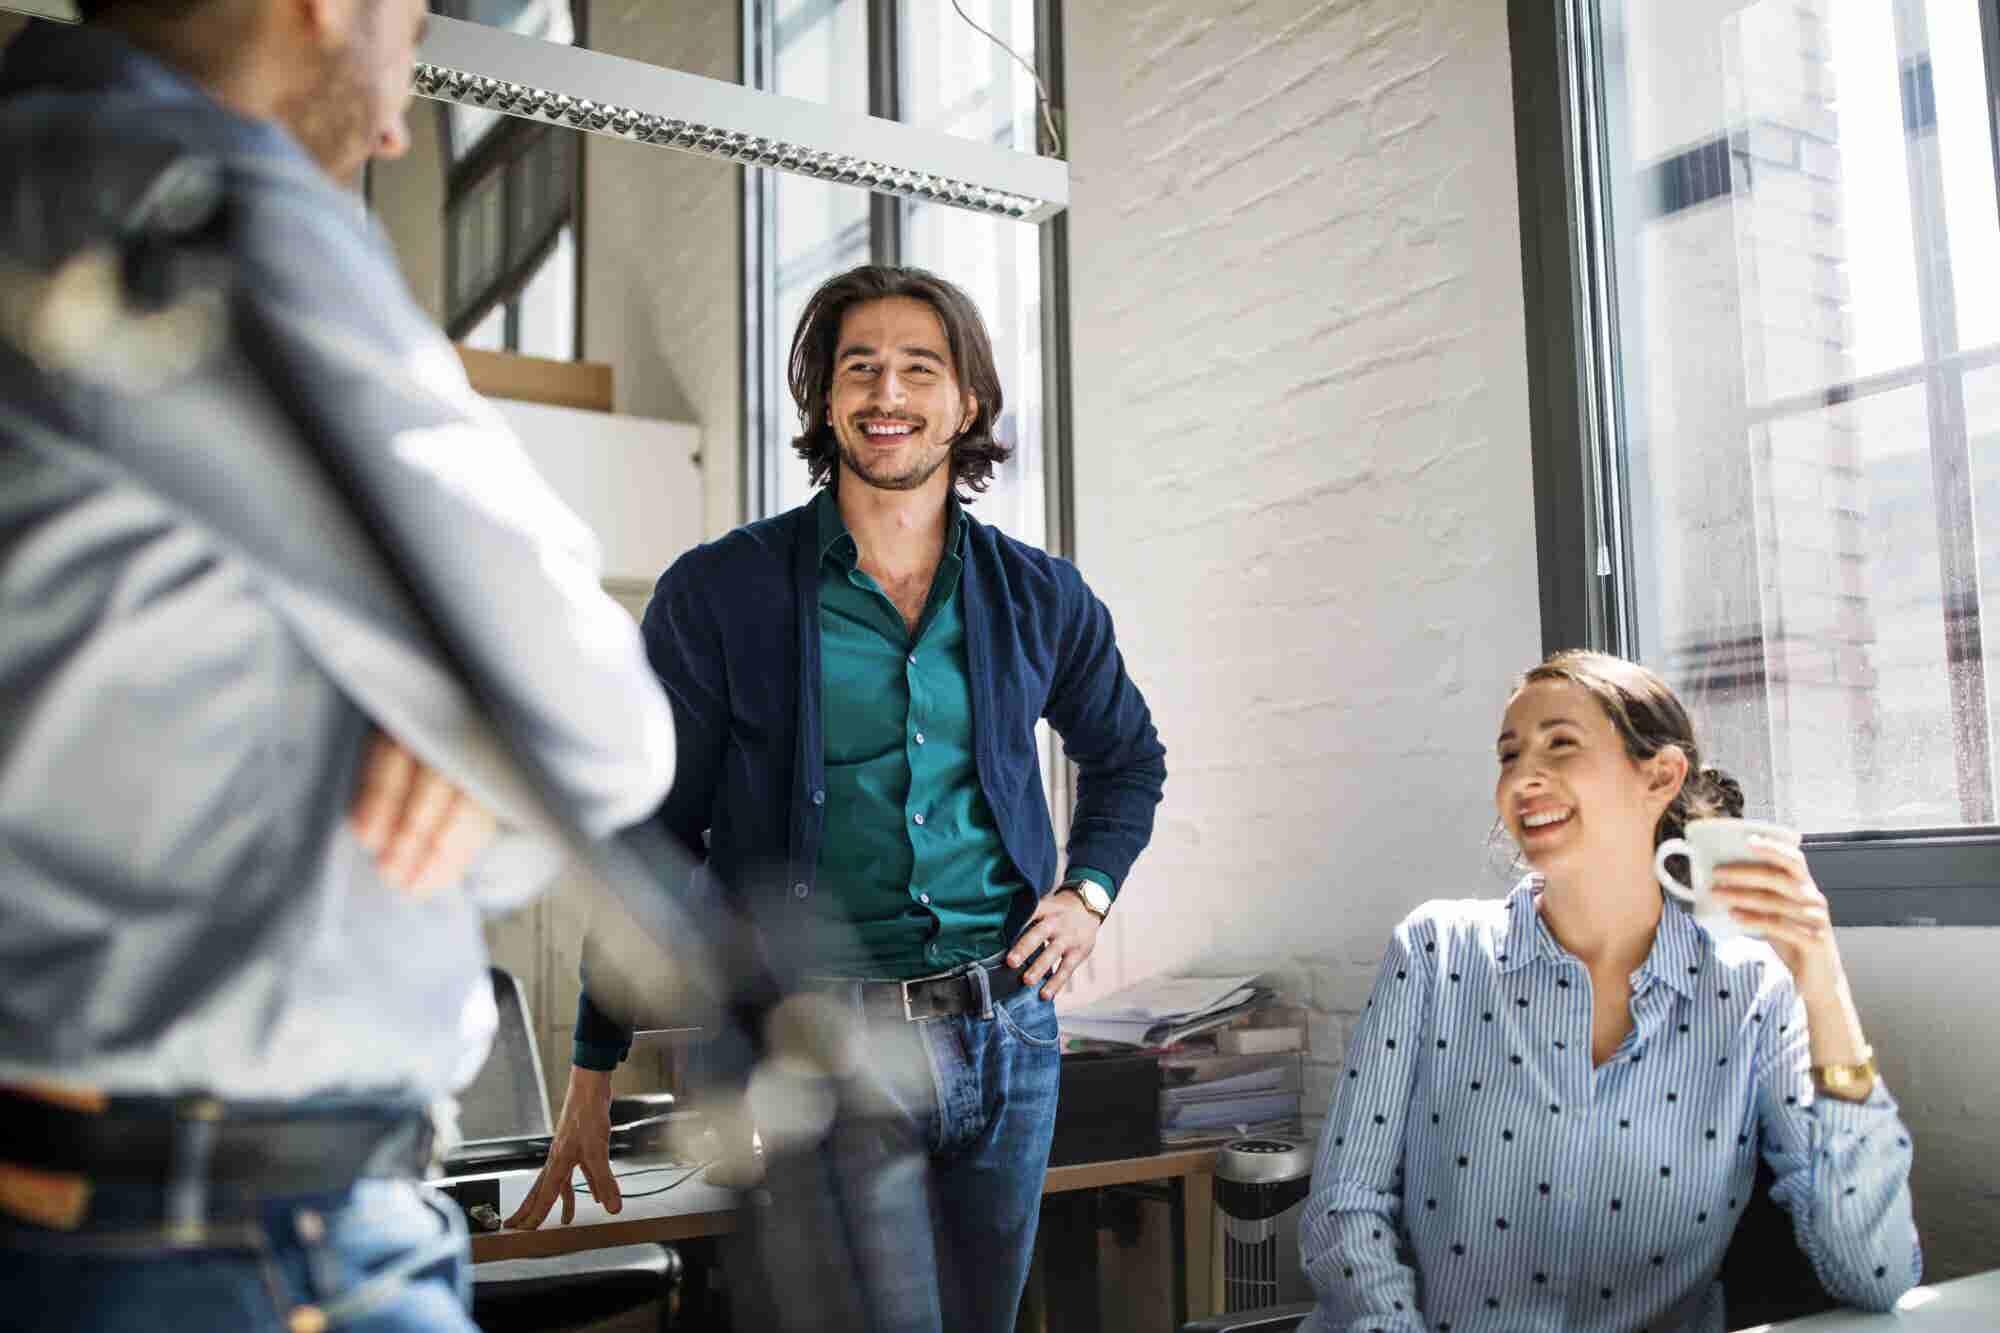 11 Proven Ways Young Entrepreneurs Can Retain Employees